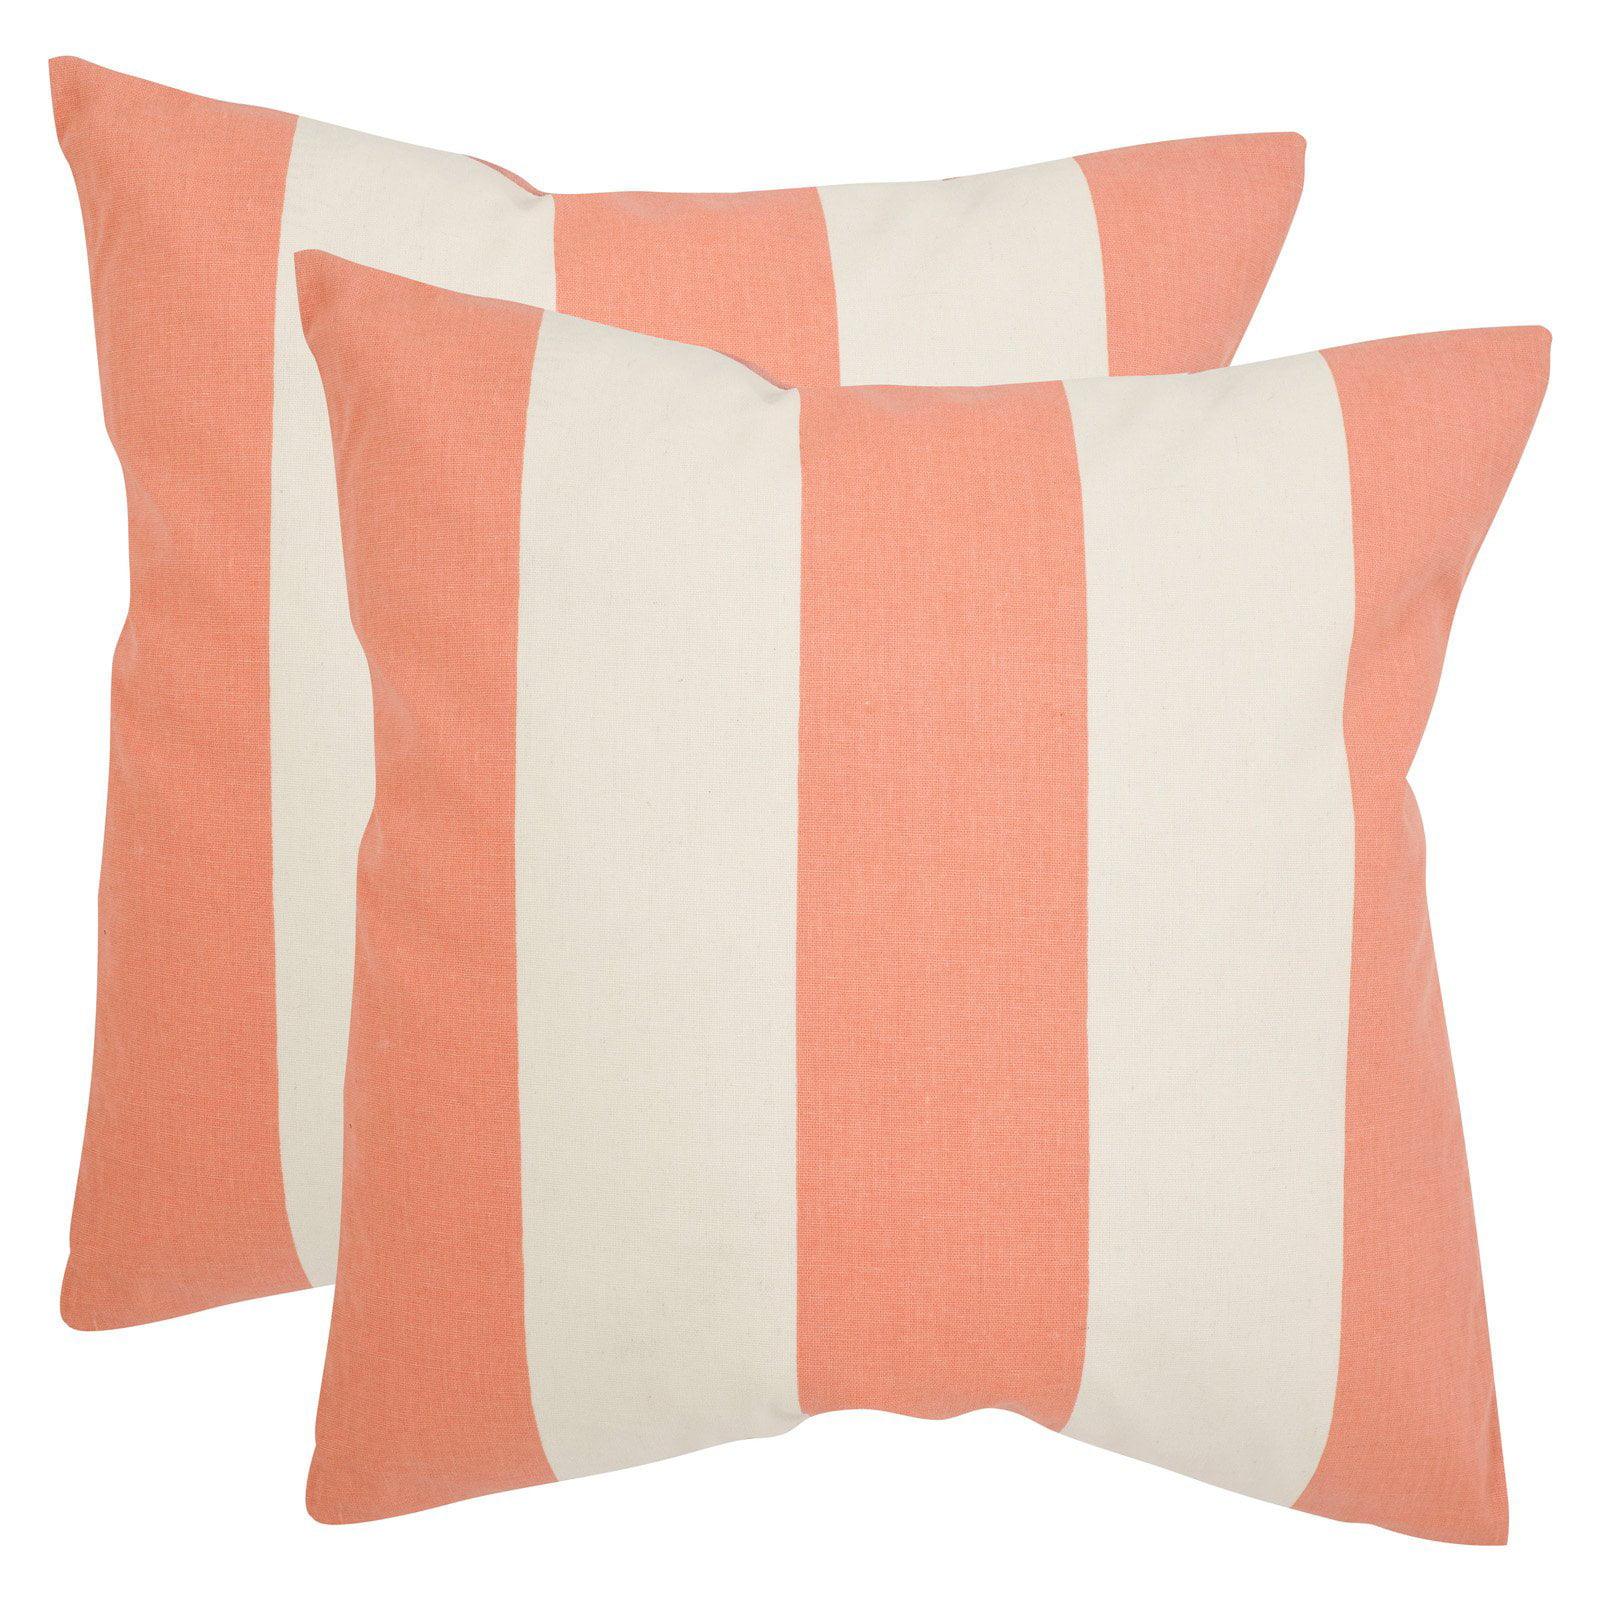 Safavieh Sally Decorative Pillows - Set of 2